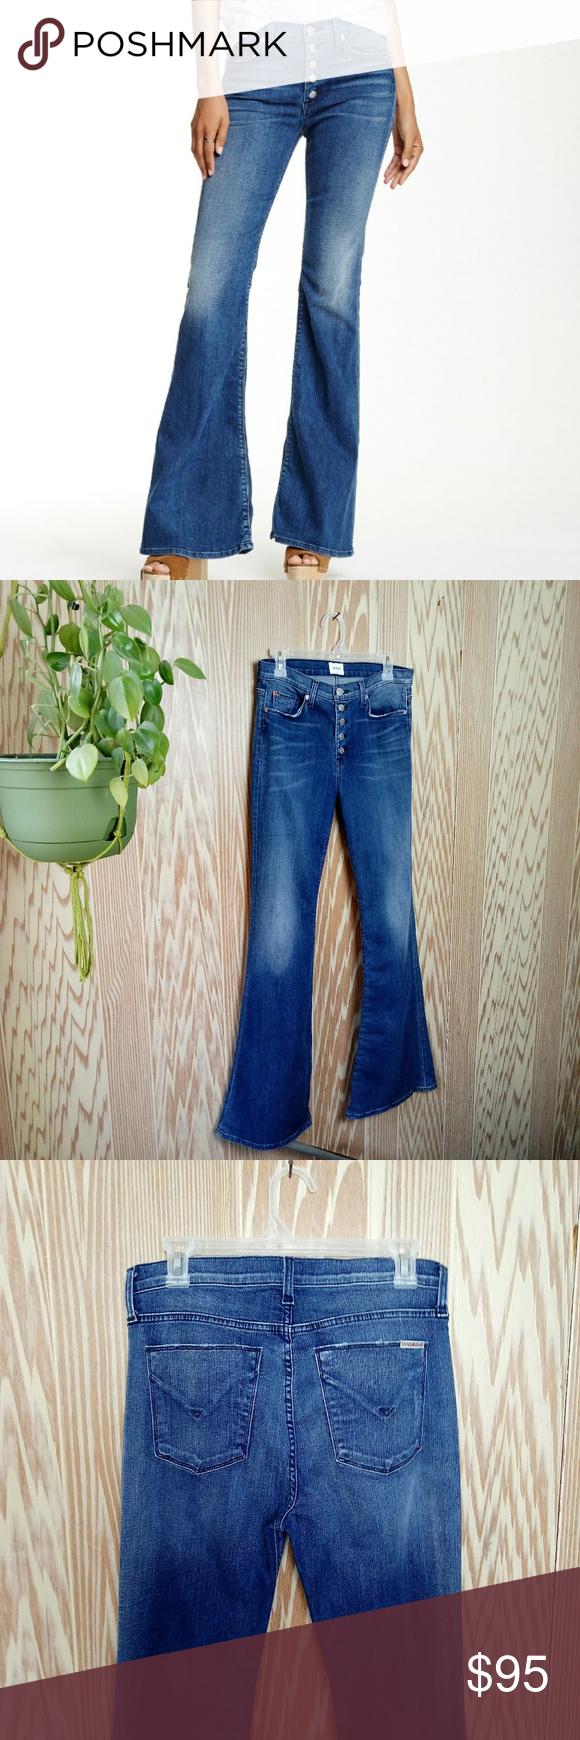 30e935721 Hudson Jodi High Waist Denim Flare Jeans 29 Button Hudson Jodi High Waist Flare  Jeans Women s